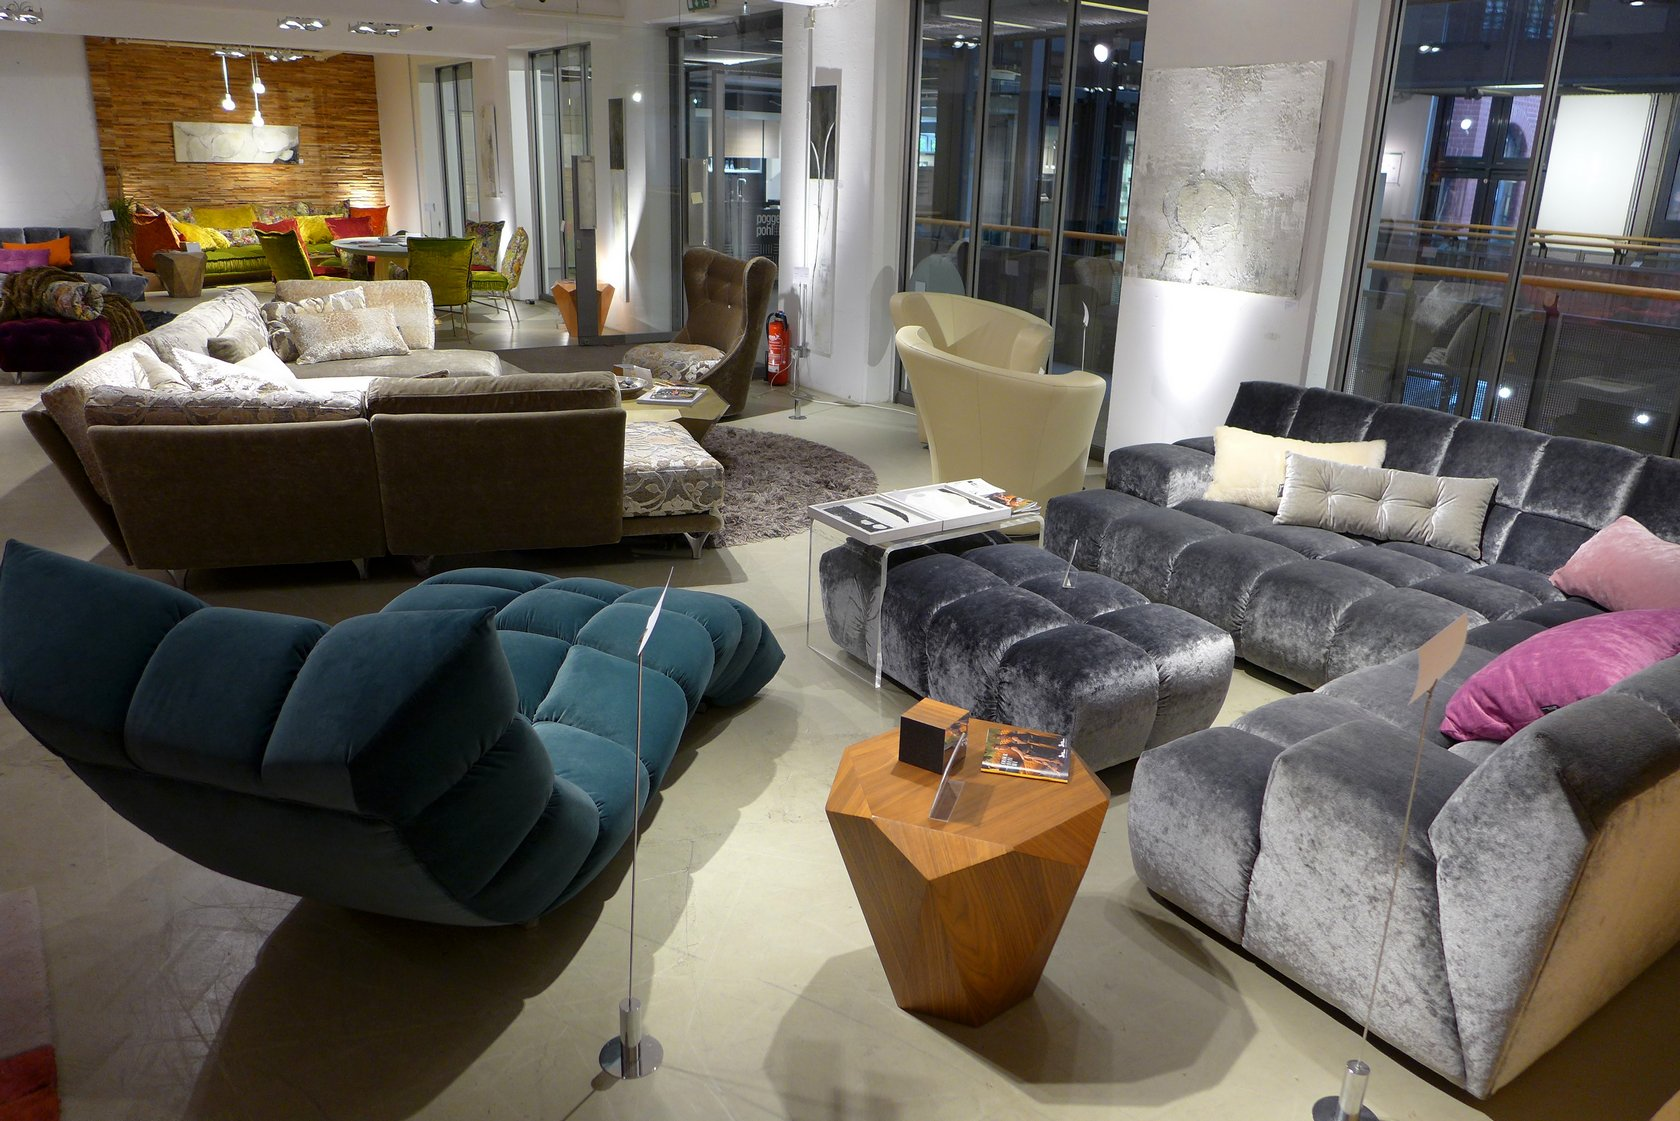 bretz flagship store hamburg stilwerk 2017 06 13 018 bretz store hamburg. Black Bedroom Furniture Sets. Home Design Ideas